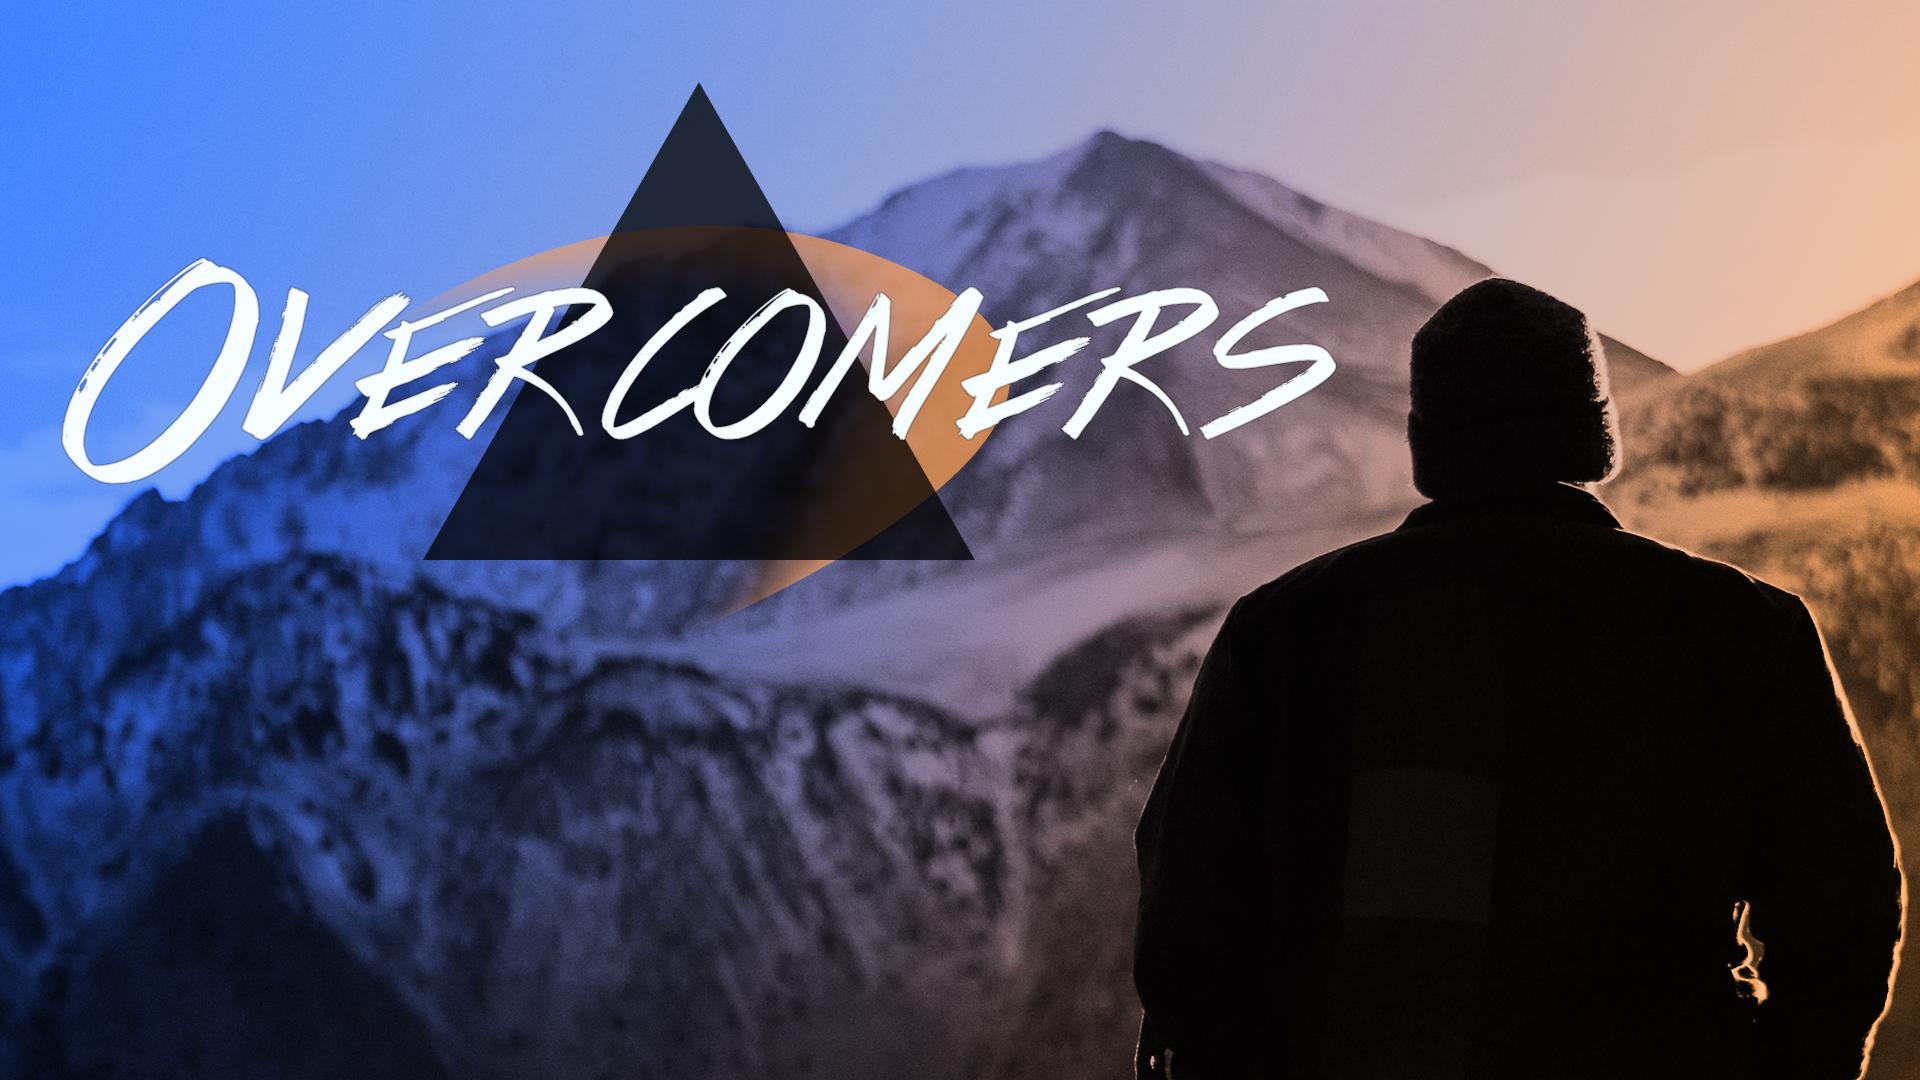 2017-Overcomers-Exterior.jpg